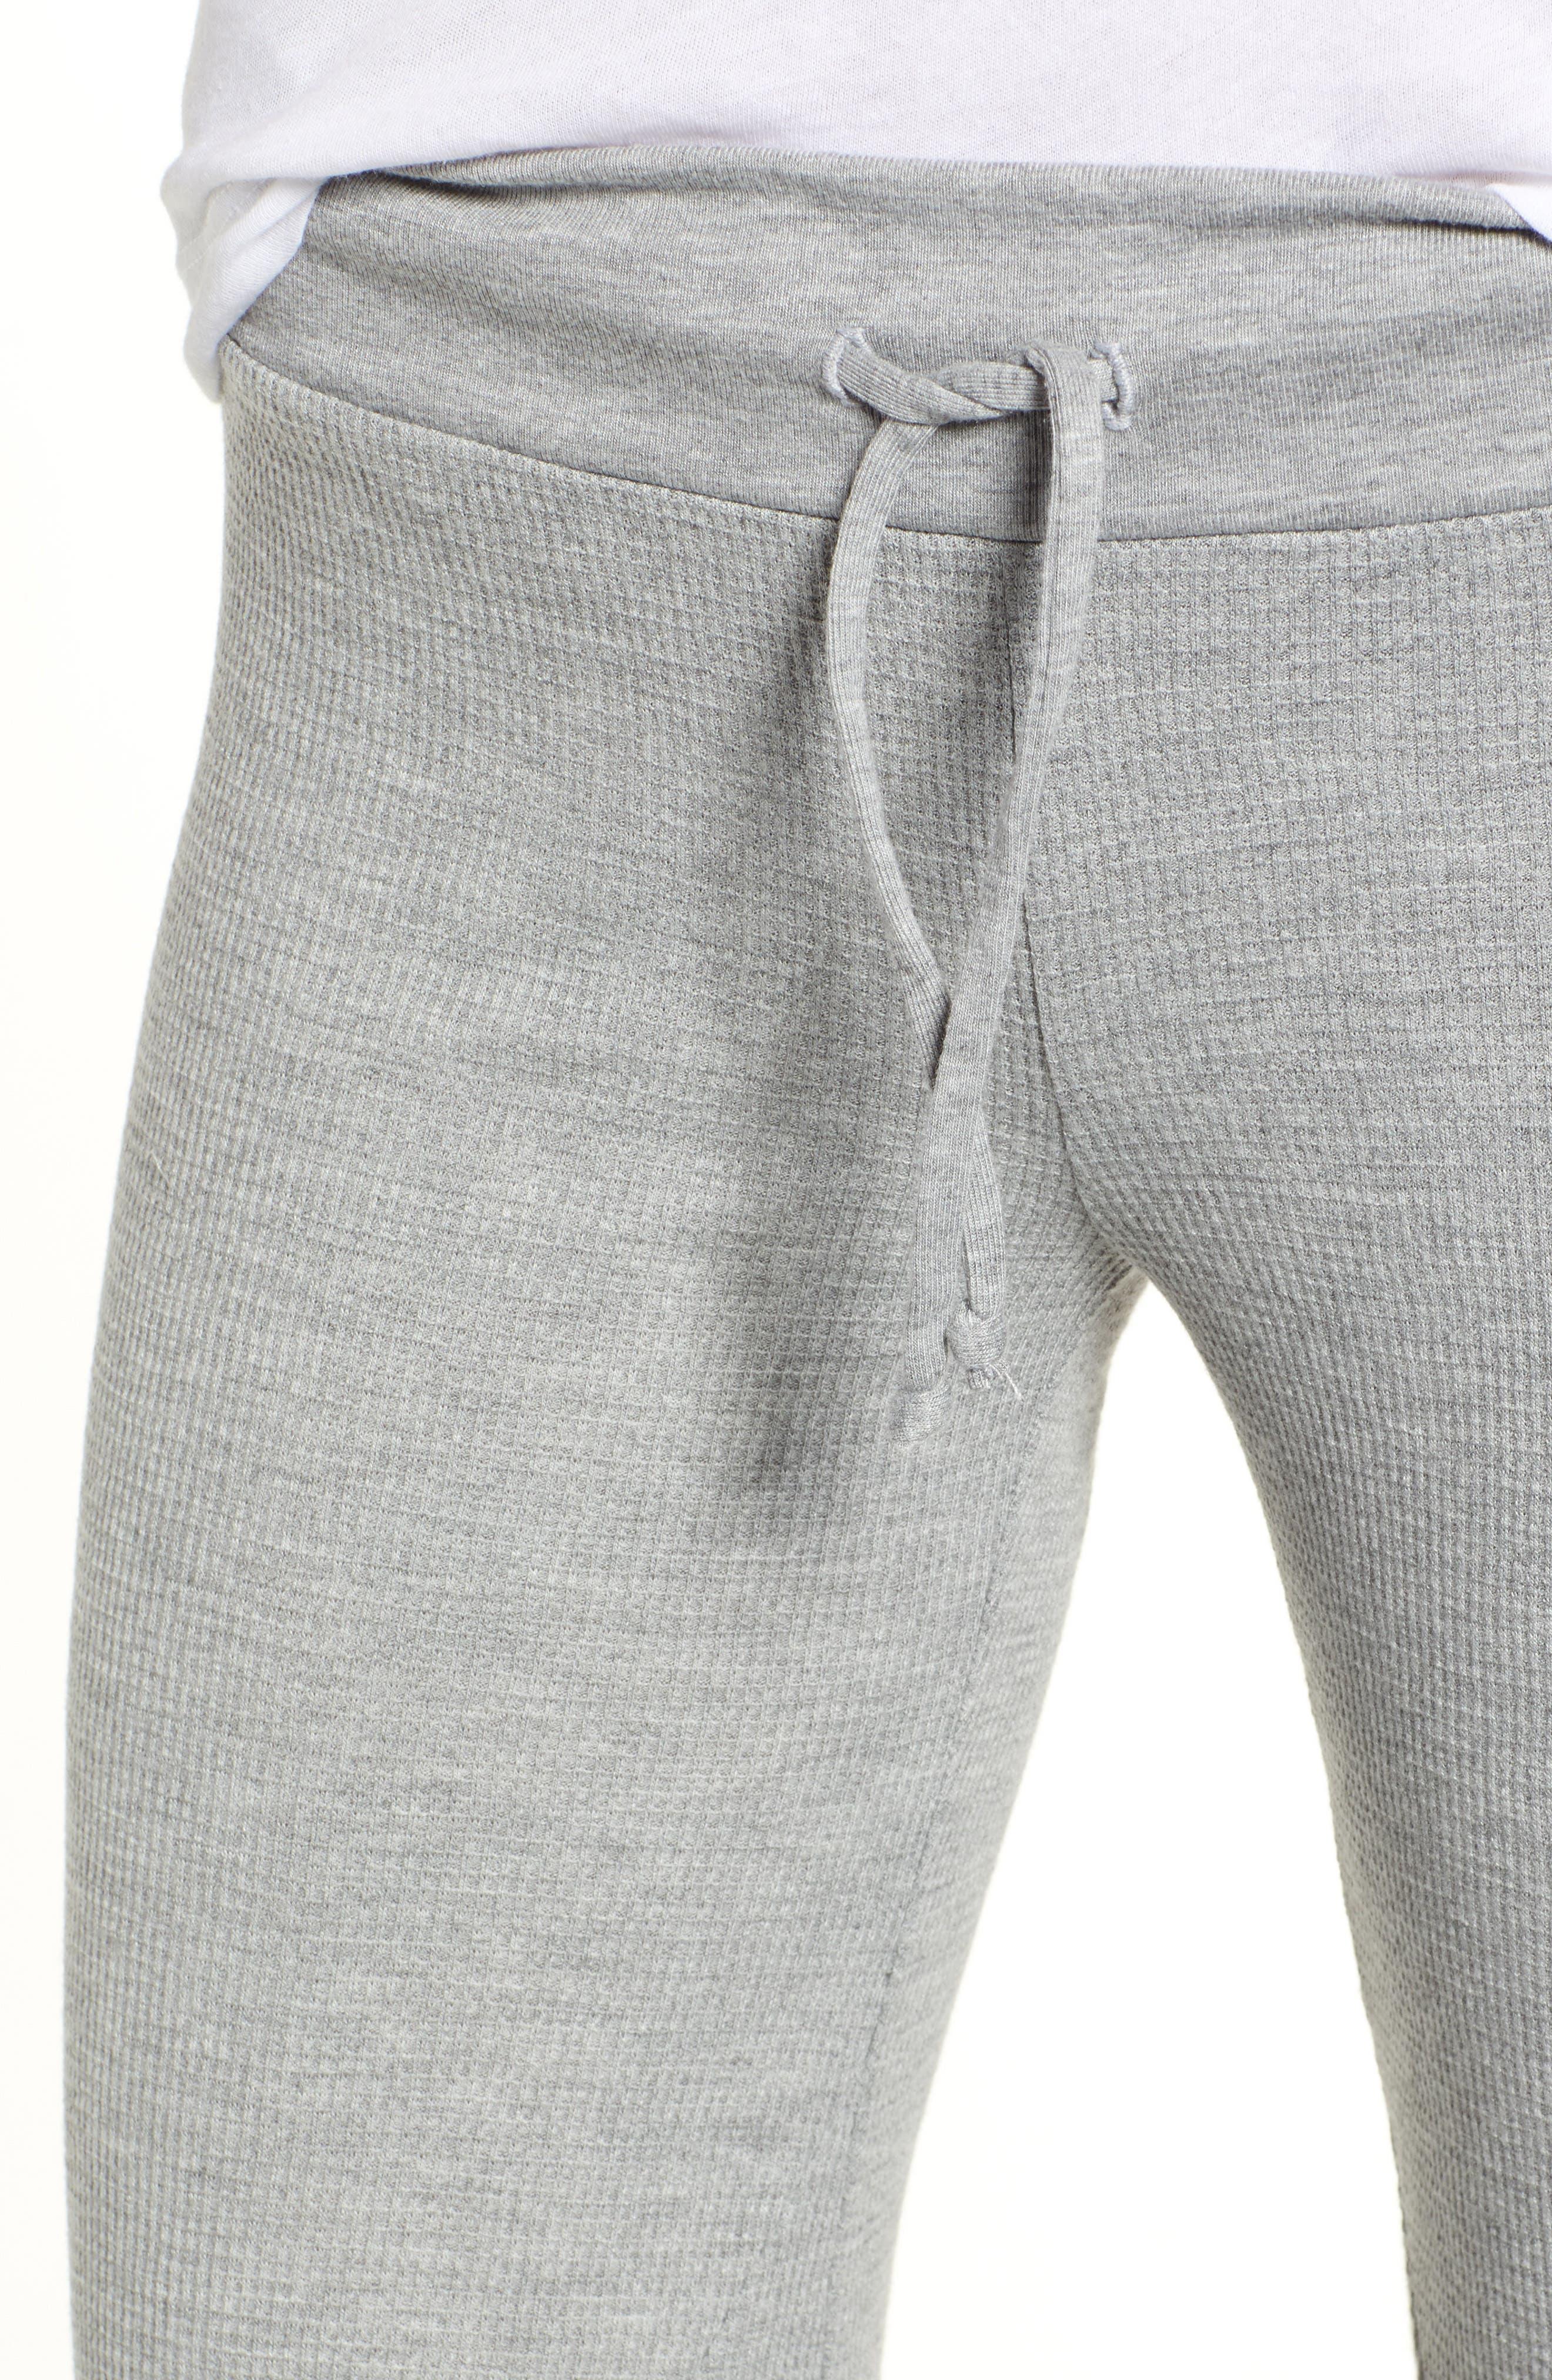 Corso Flared Thermal Sweatpants,                             Alternate thumbnail 4, color,                             020